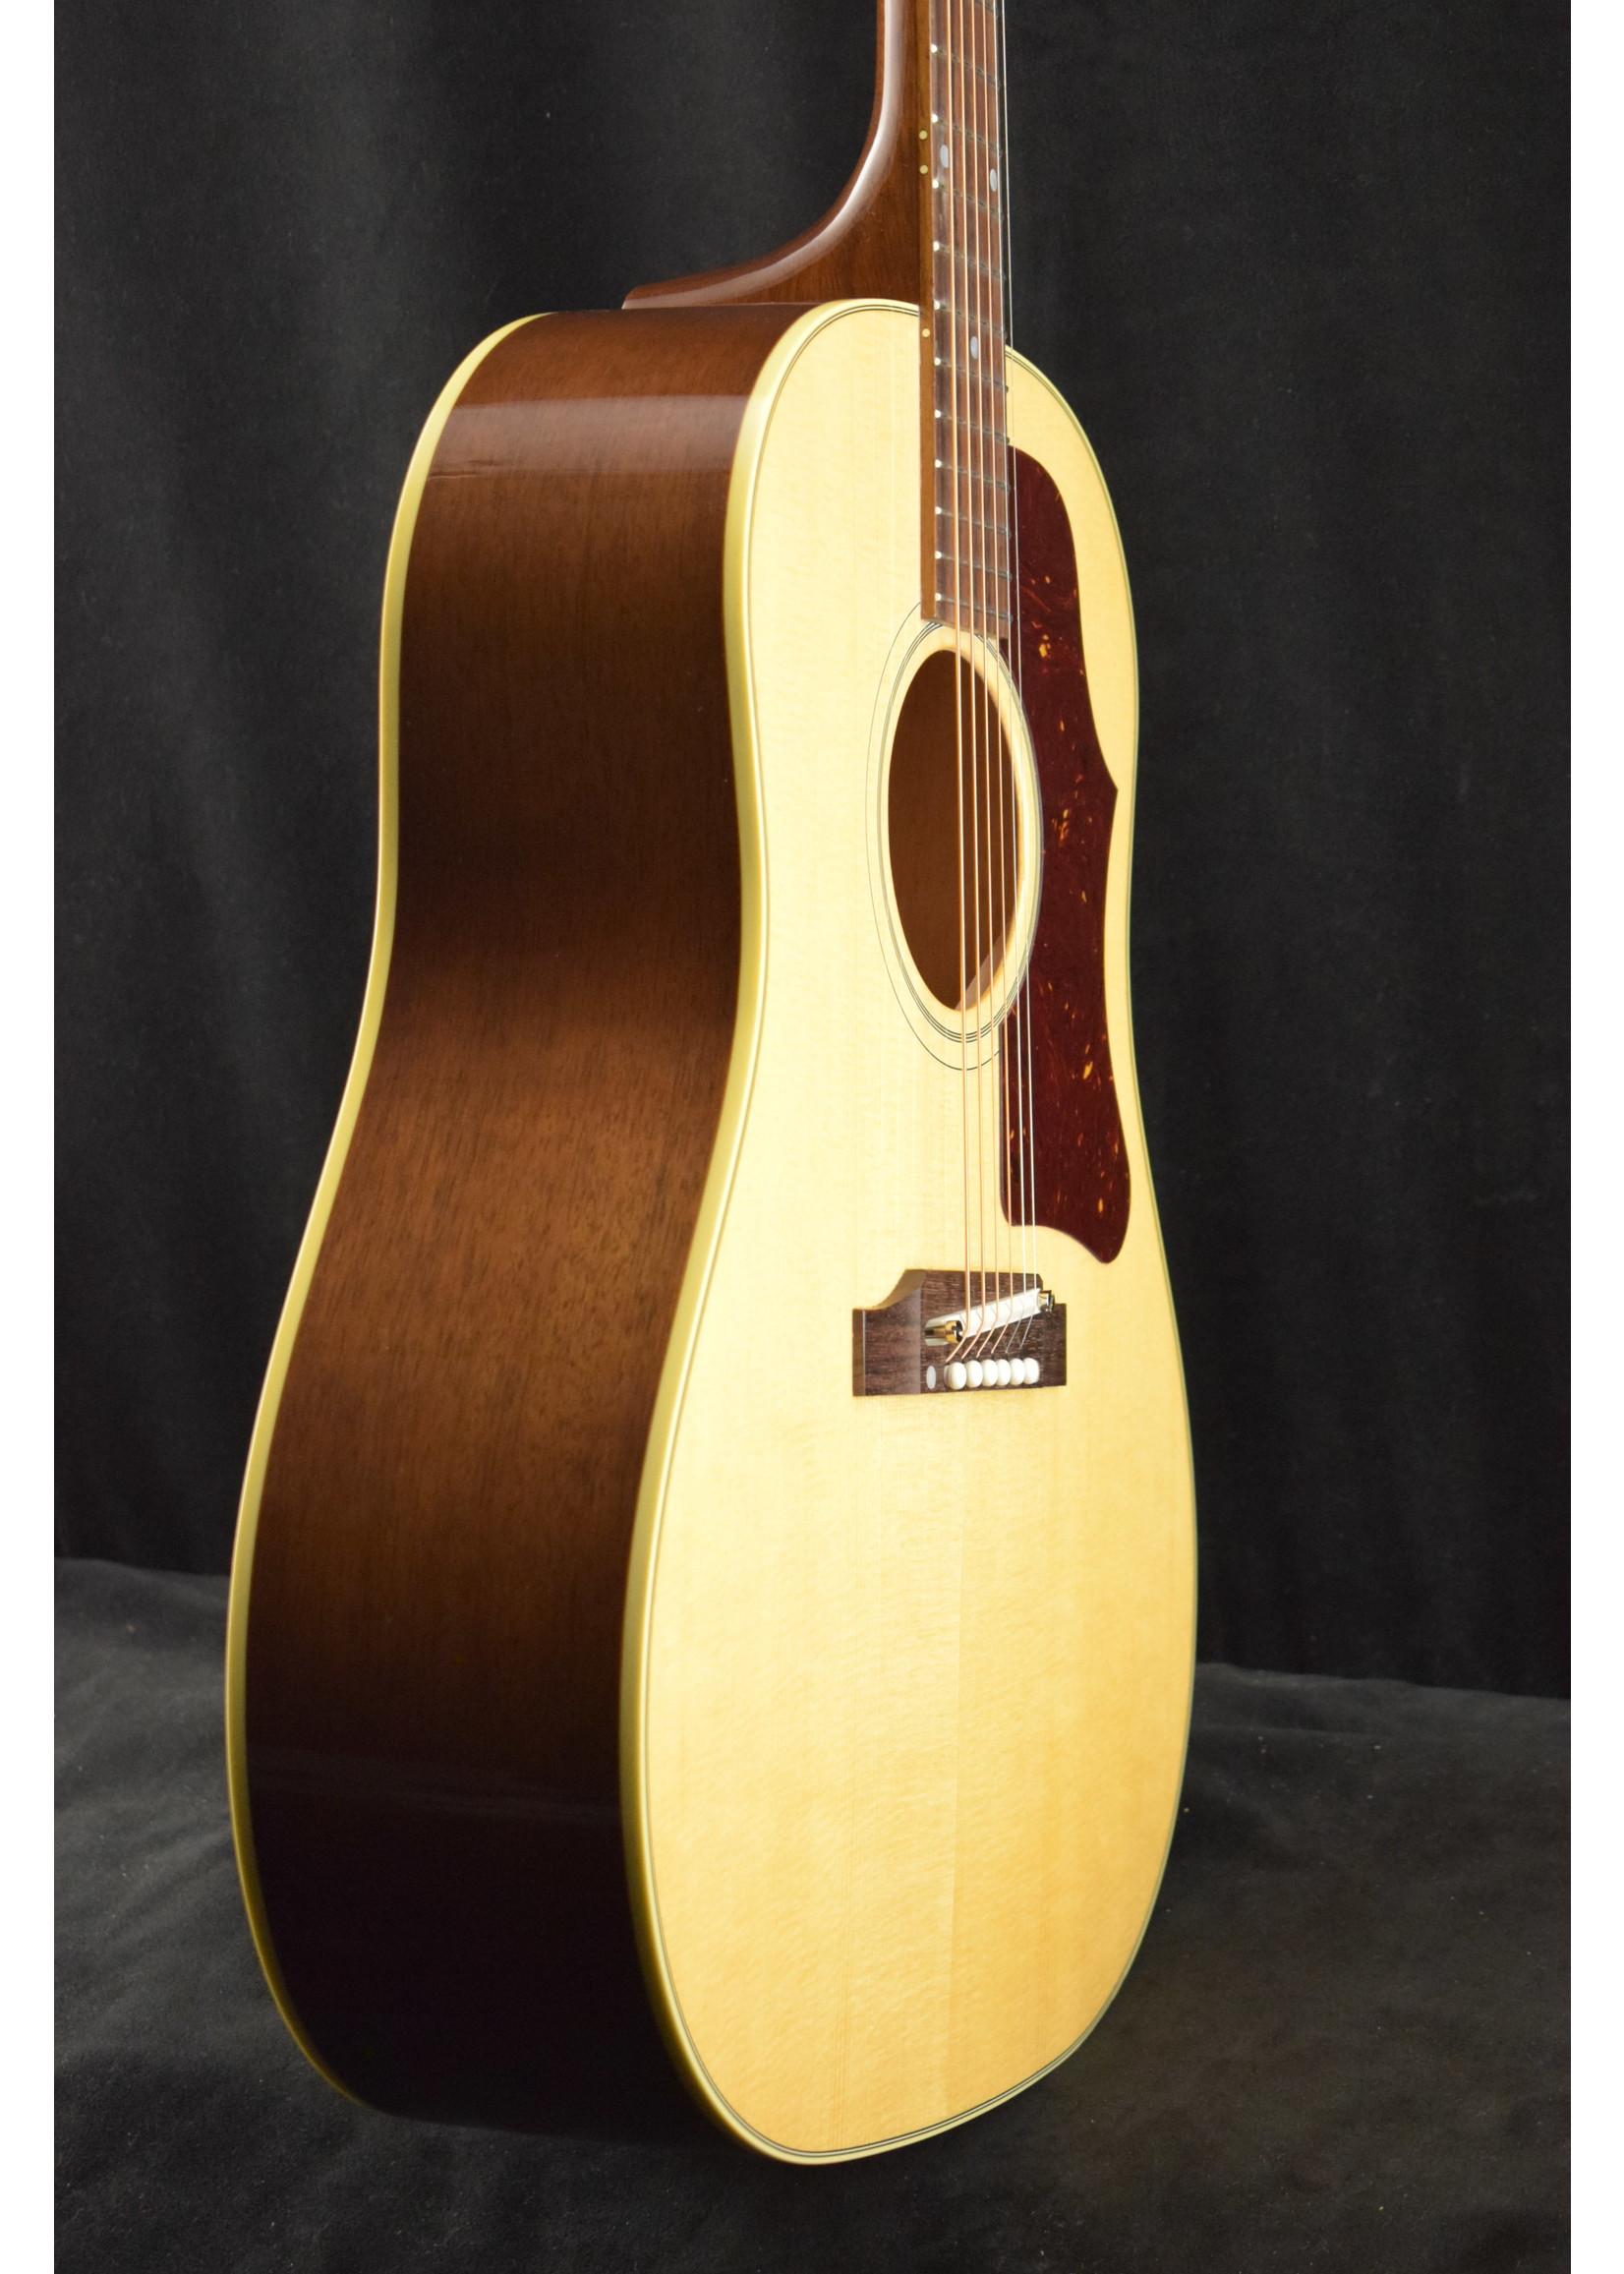 Gibson Gibson 60's J-50 Original, Adjustable Saddle (No Pickup) Natural